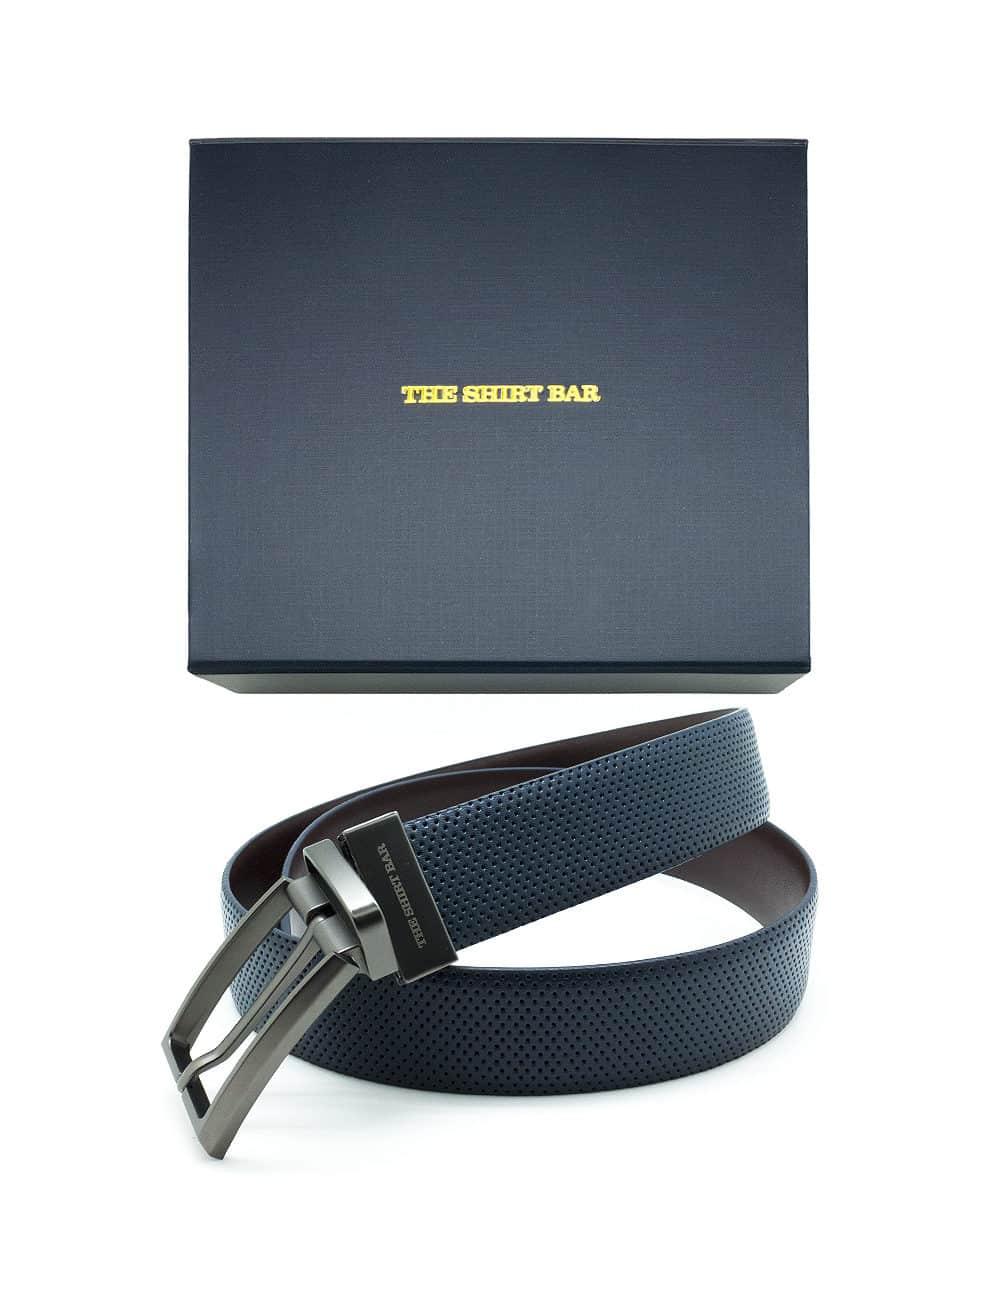 Navy / Dark Brown Reversible Leather Belt LBR12.8